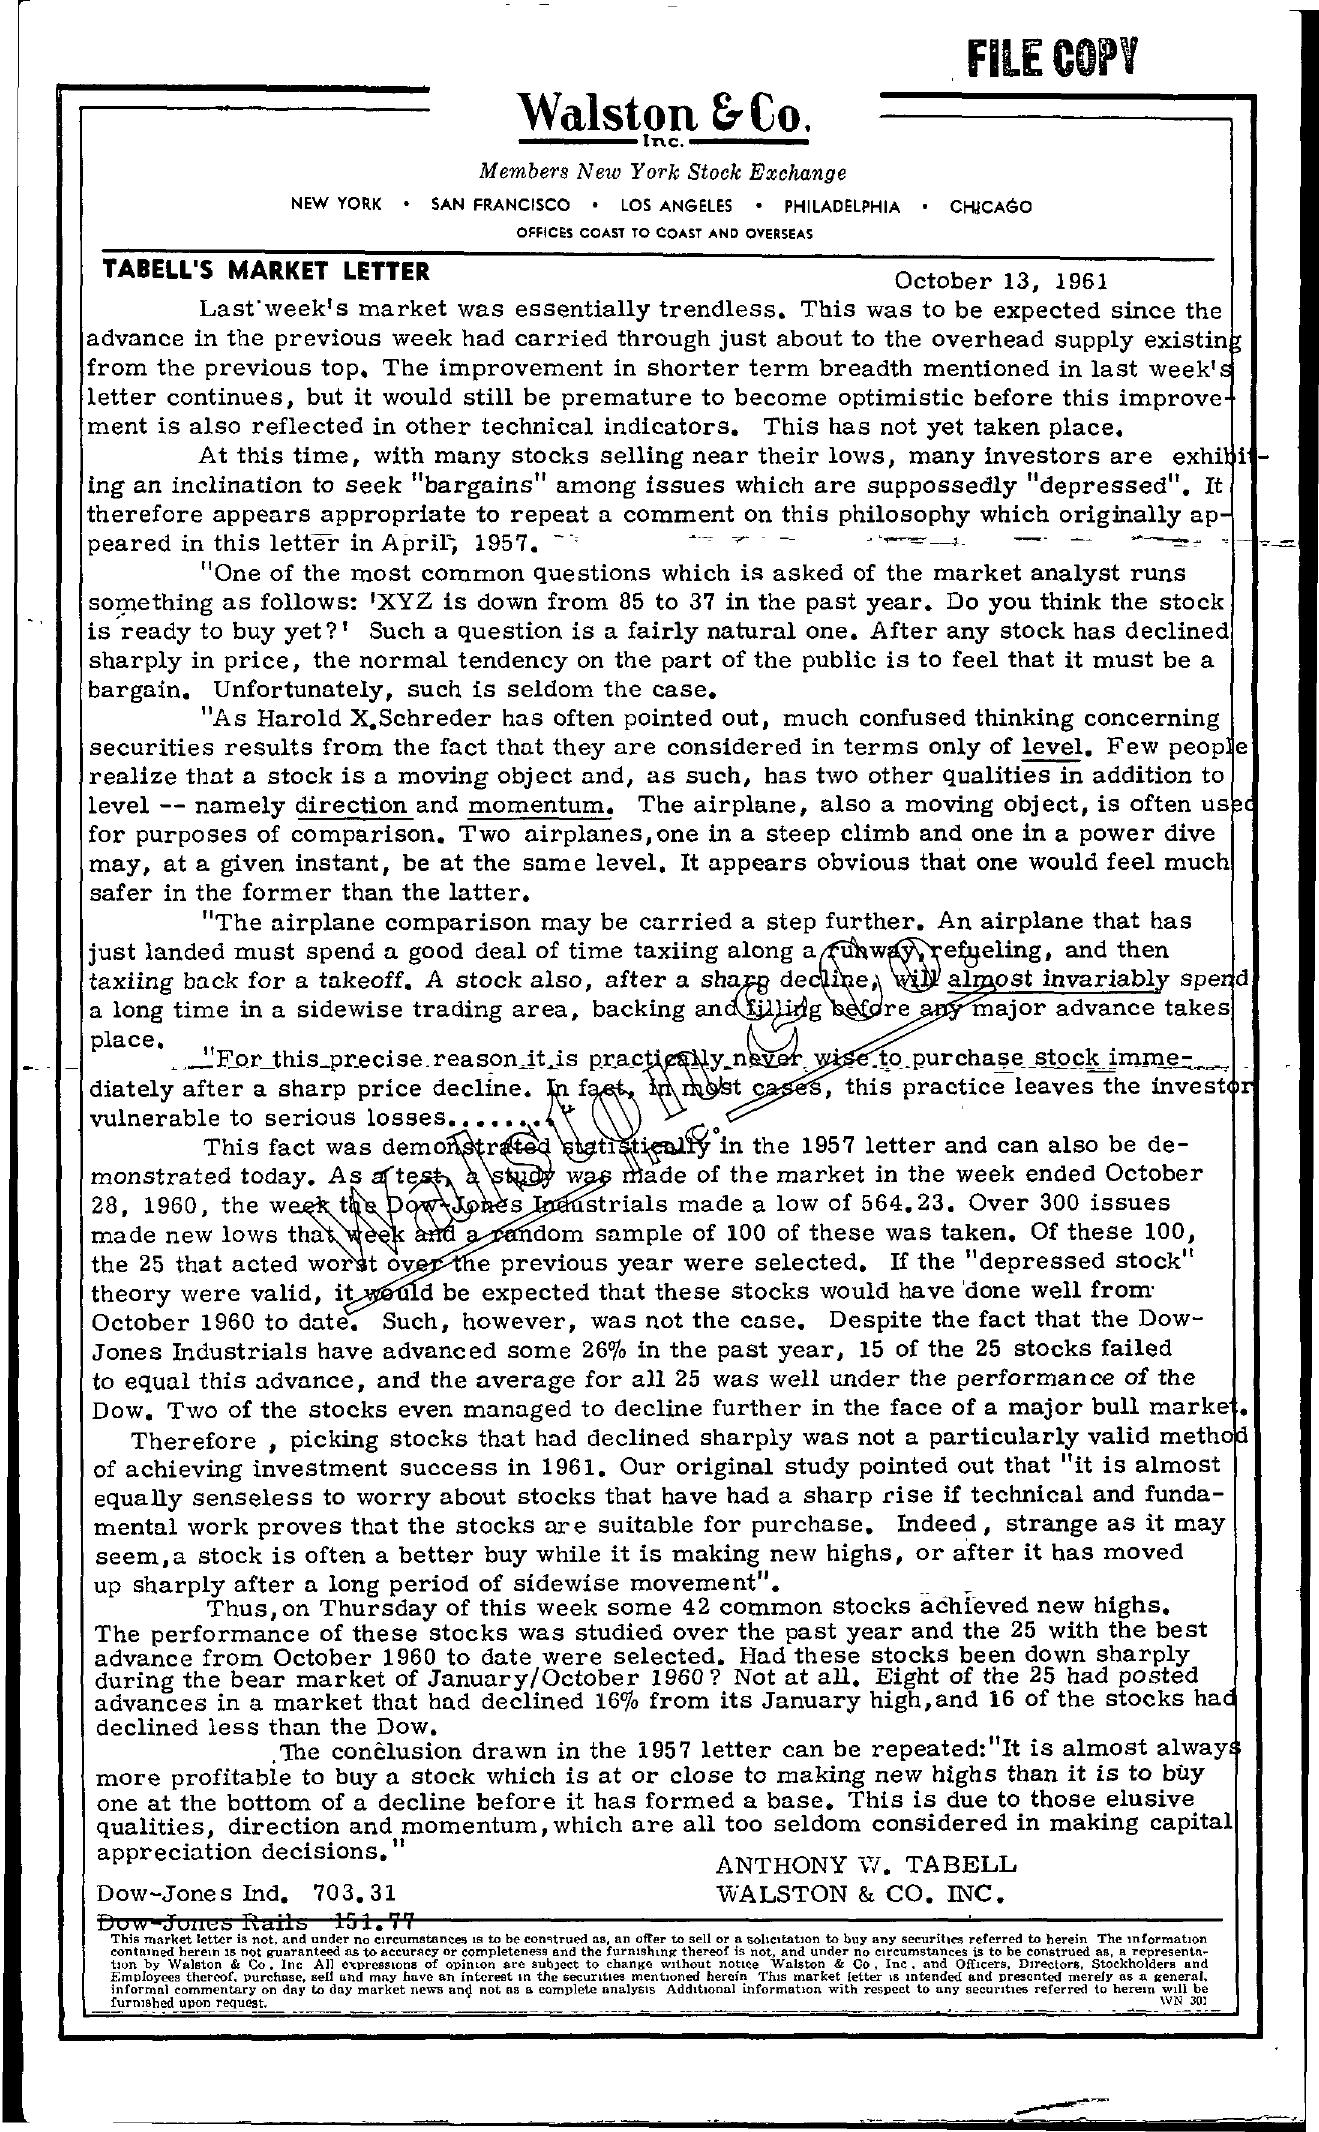 Tabell's Market Letter - October 13, 1961